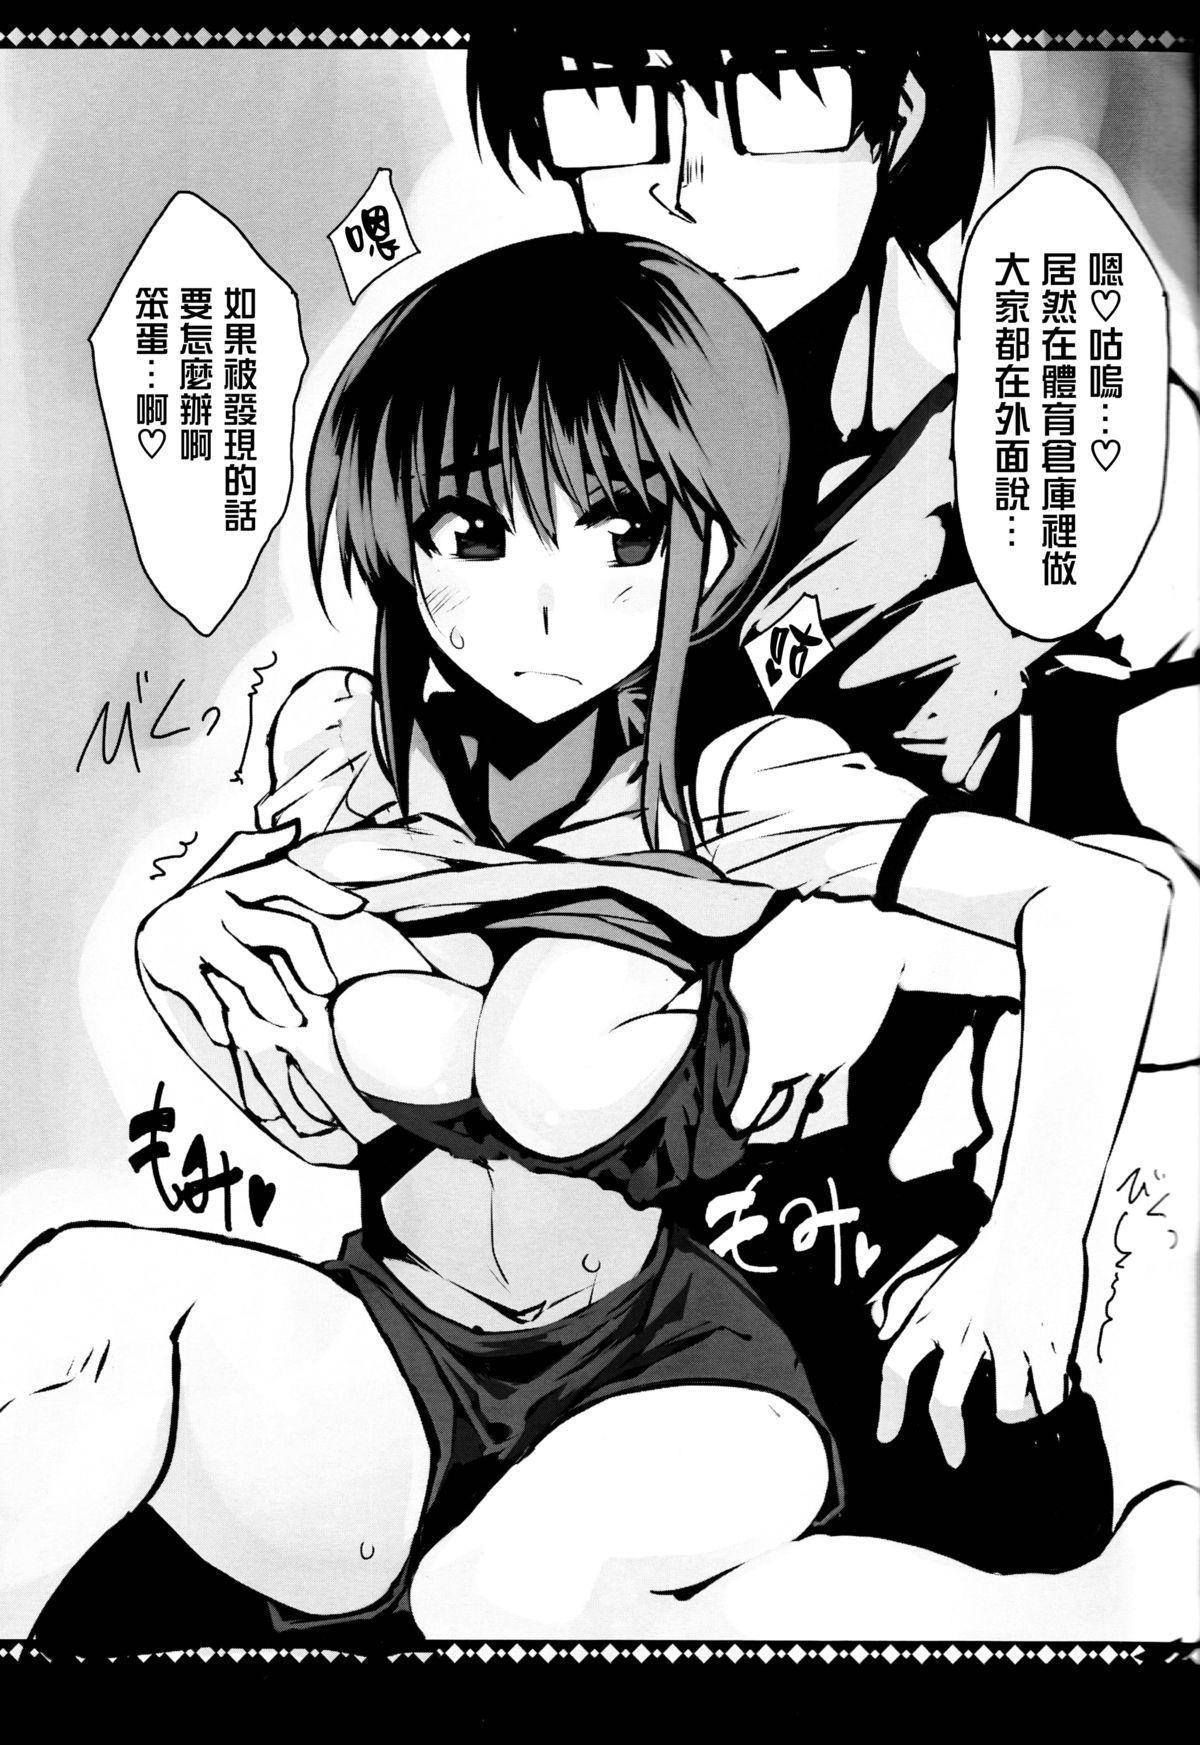 Fuyumiko 18